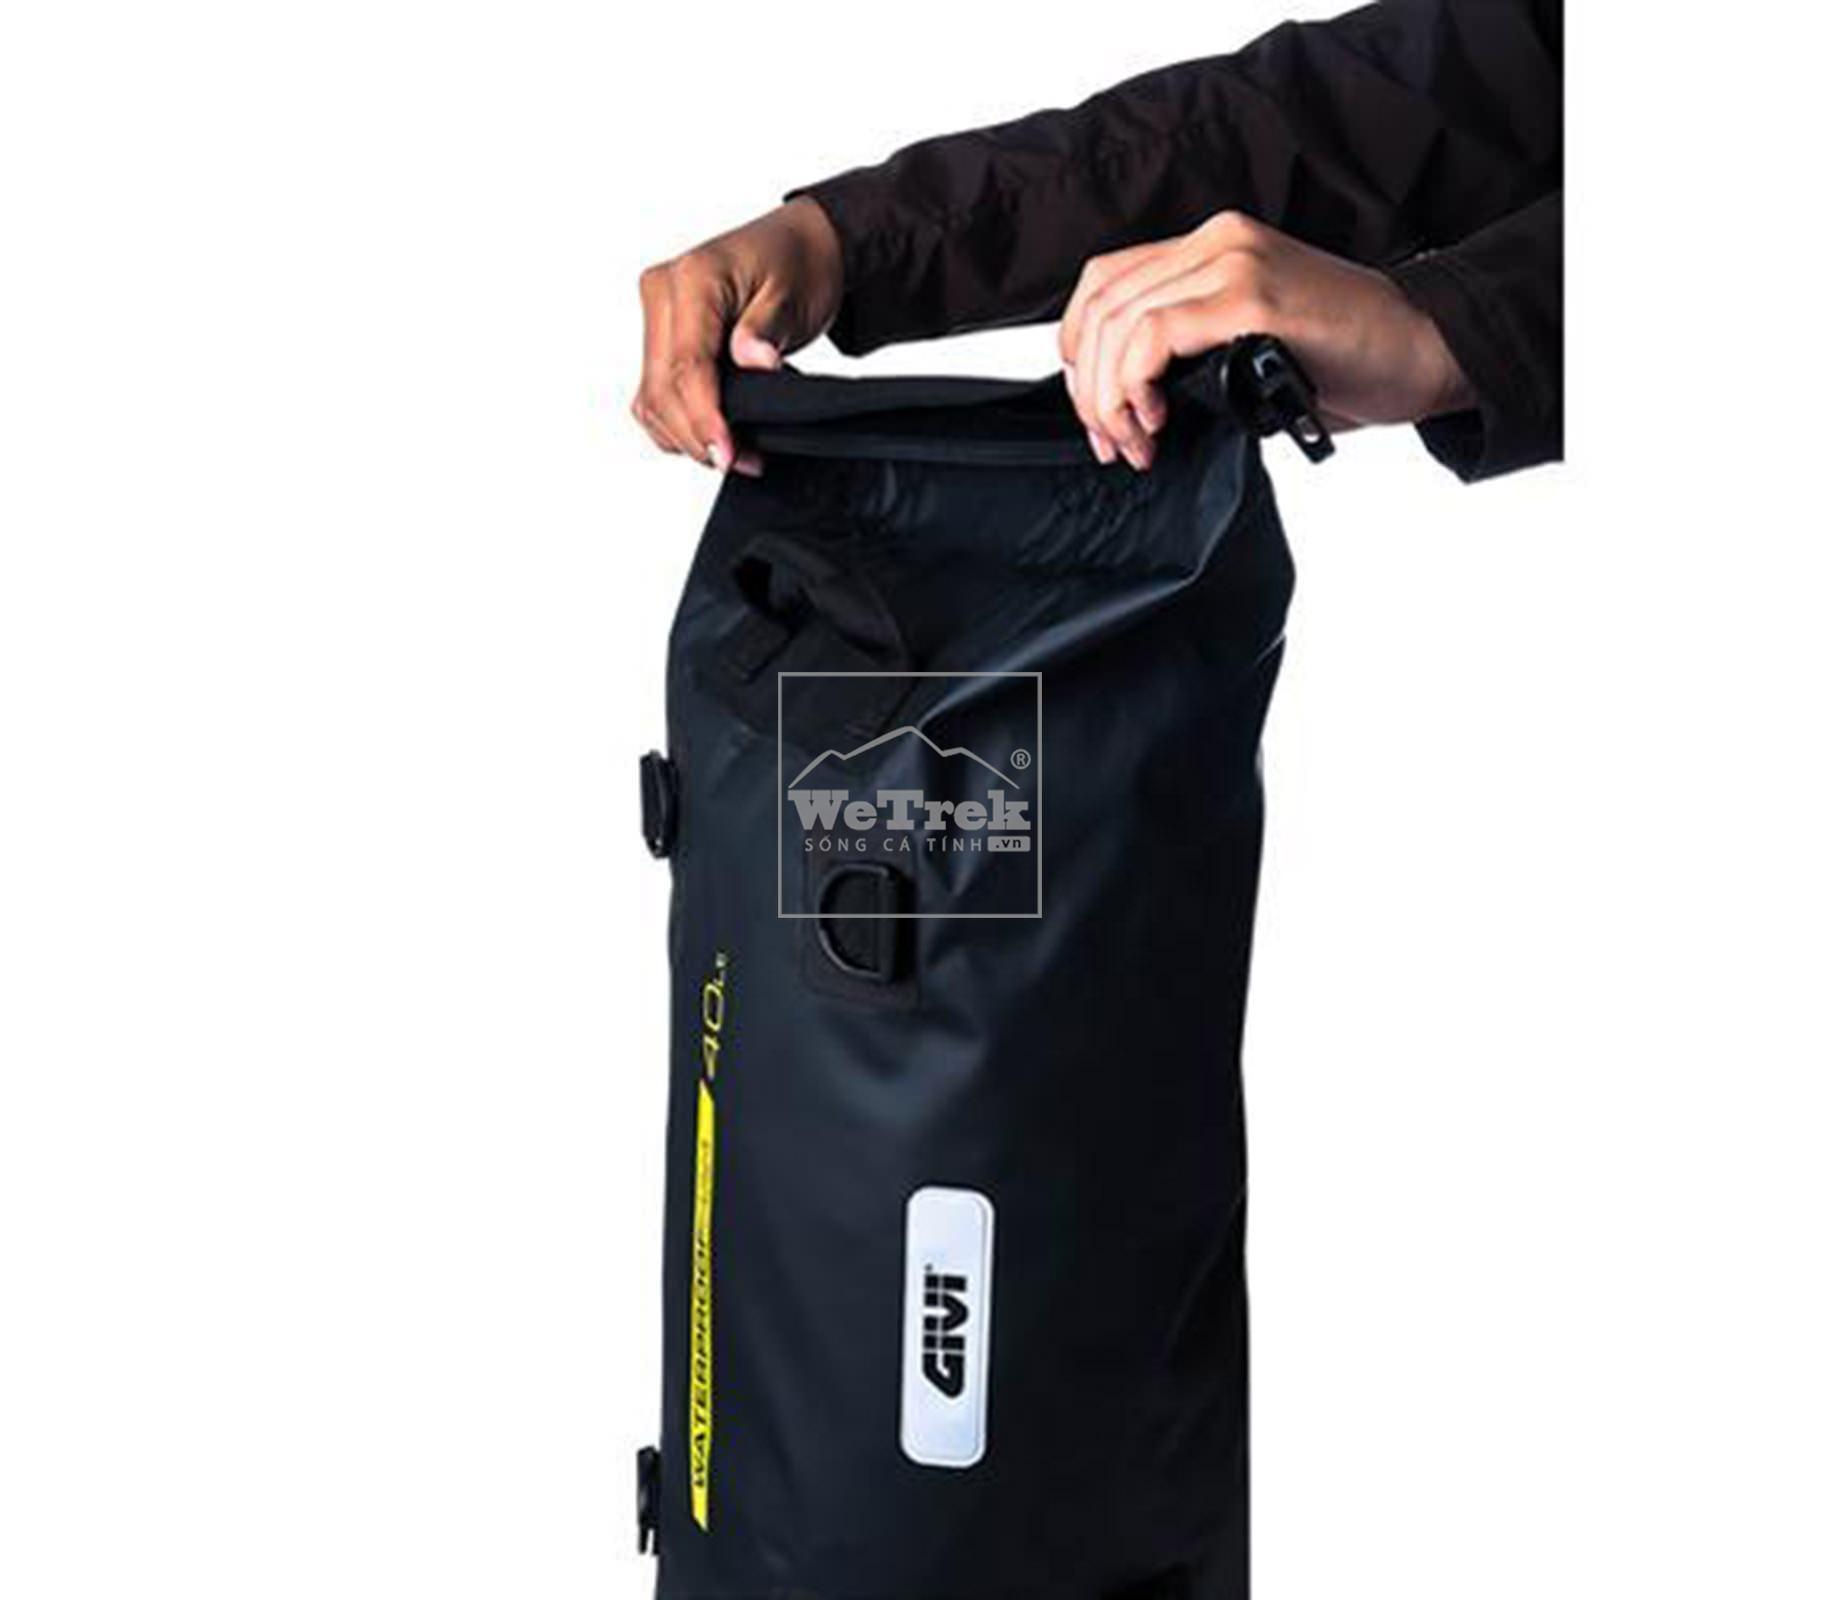 tui-chong-nuoc-40L-givi-prime-cargo-bag-pcb01-wetrek.vn-1